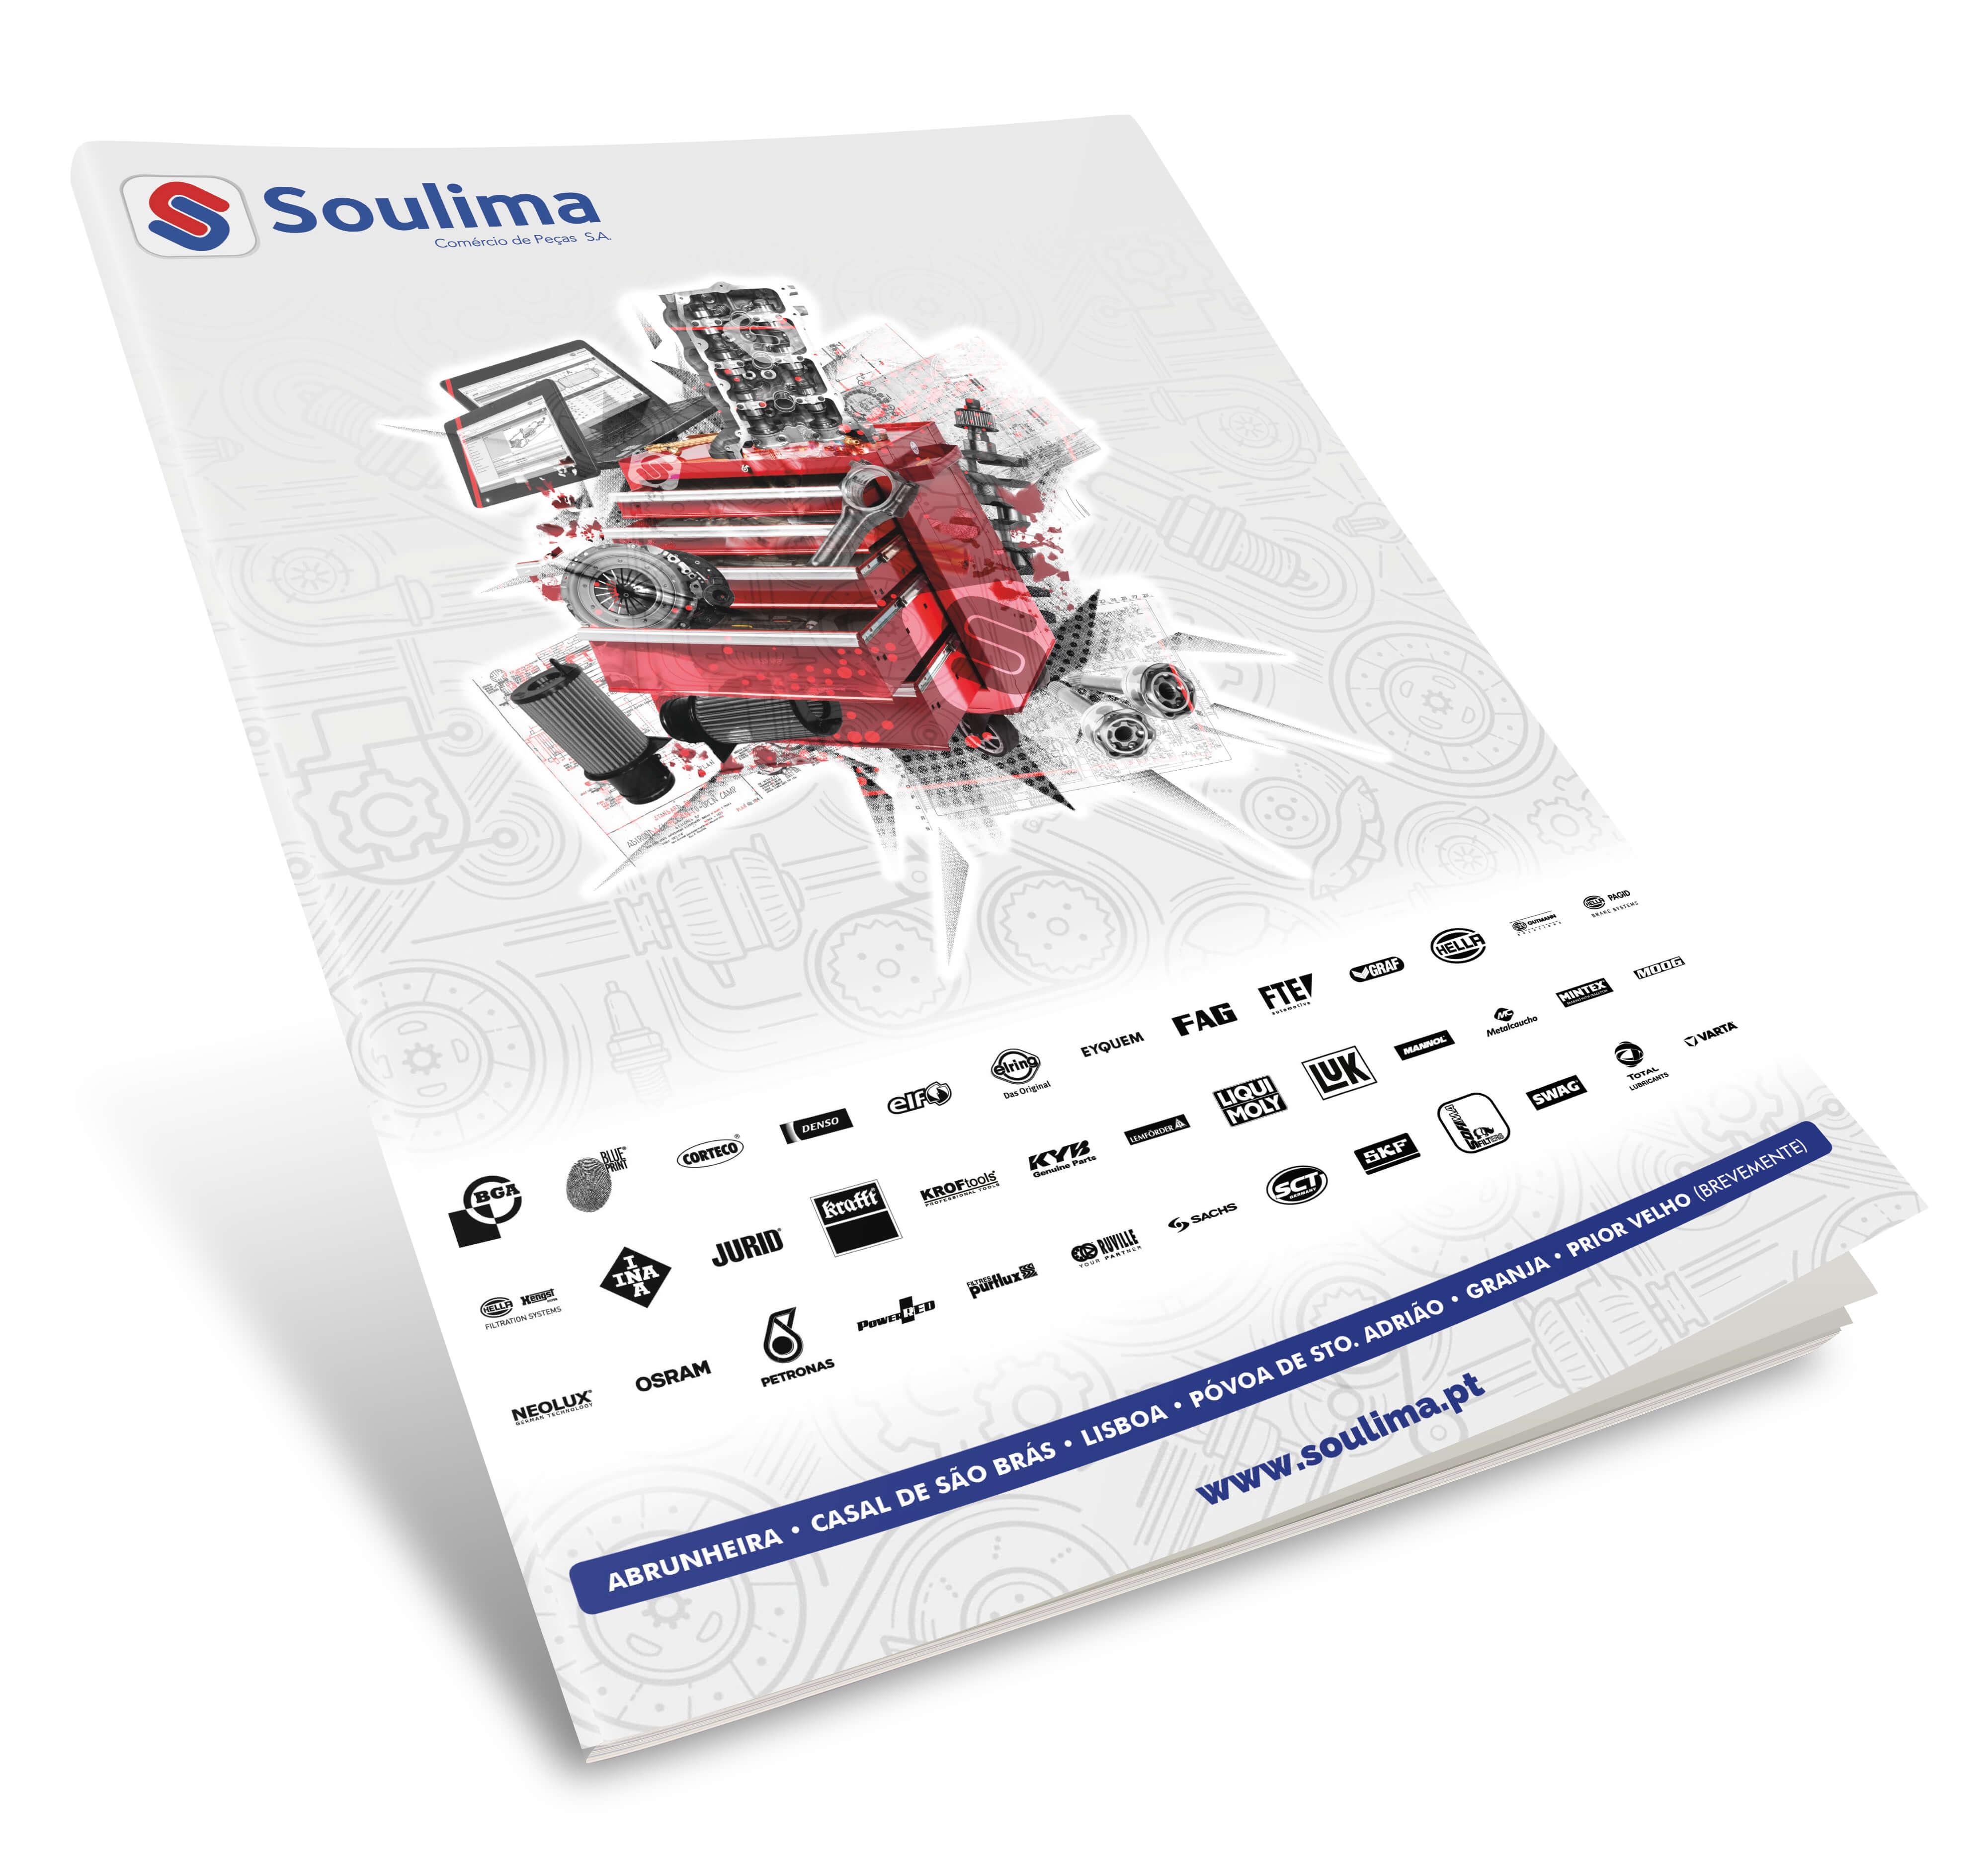 Soulima - Comércio de Peças - Mockup Brochure Soulima - Cover | Way2Start - Design & Digital Agency